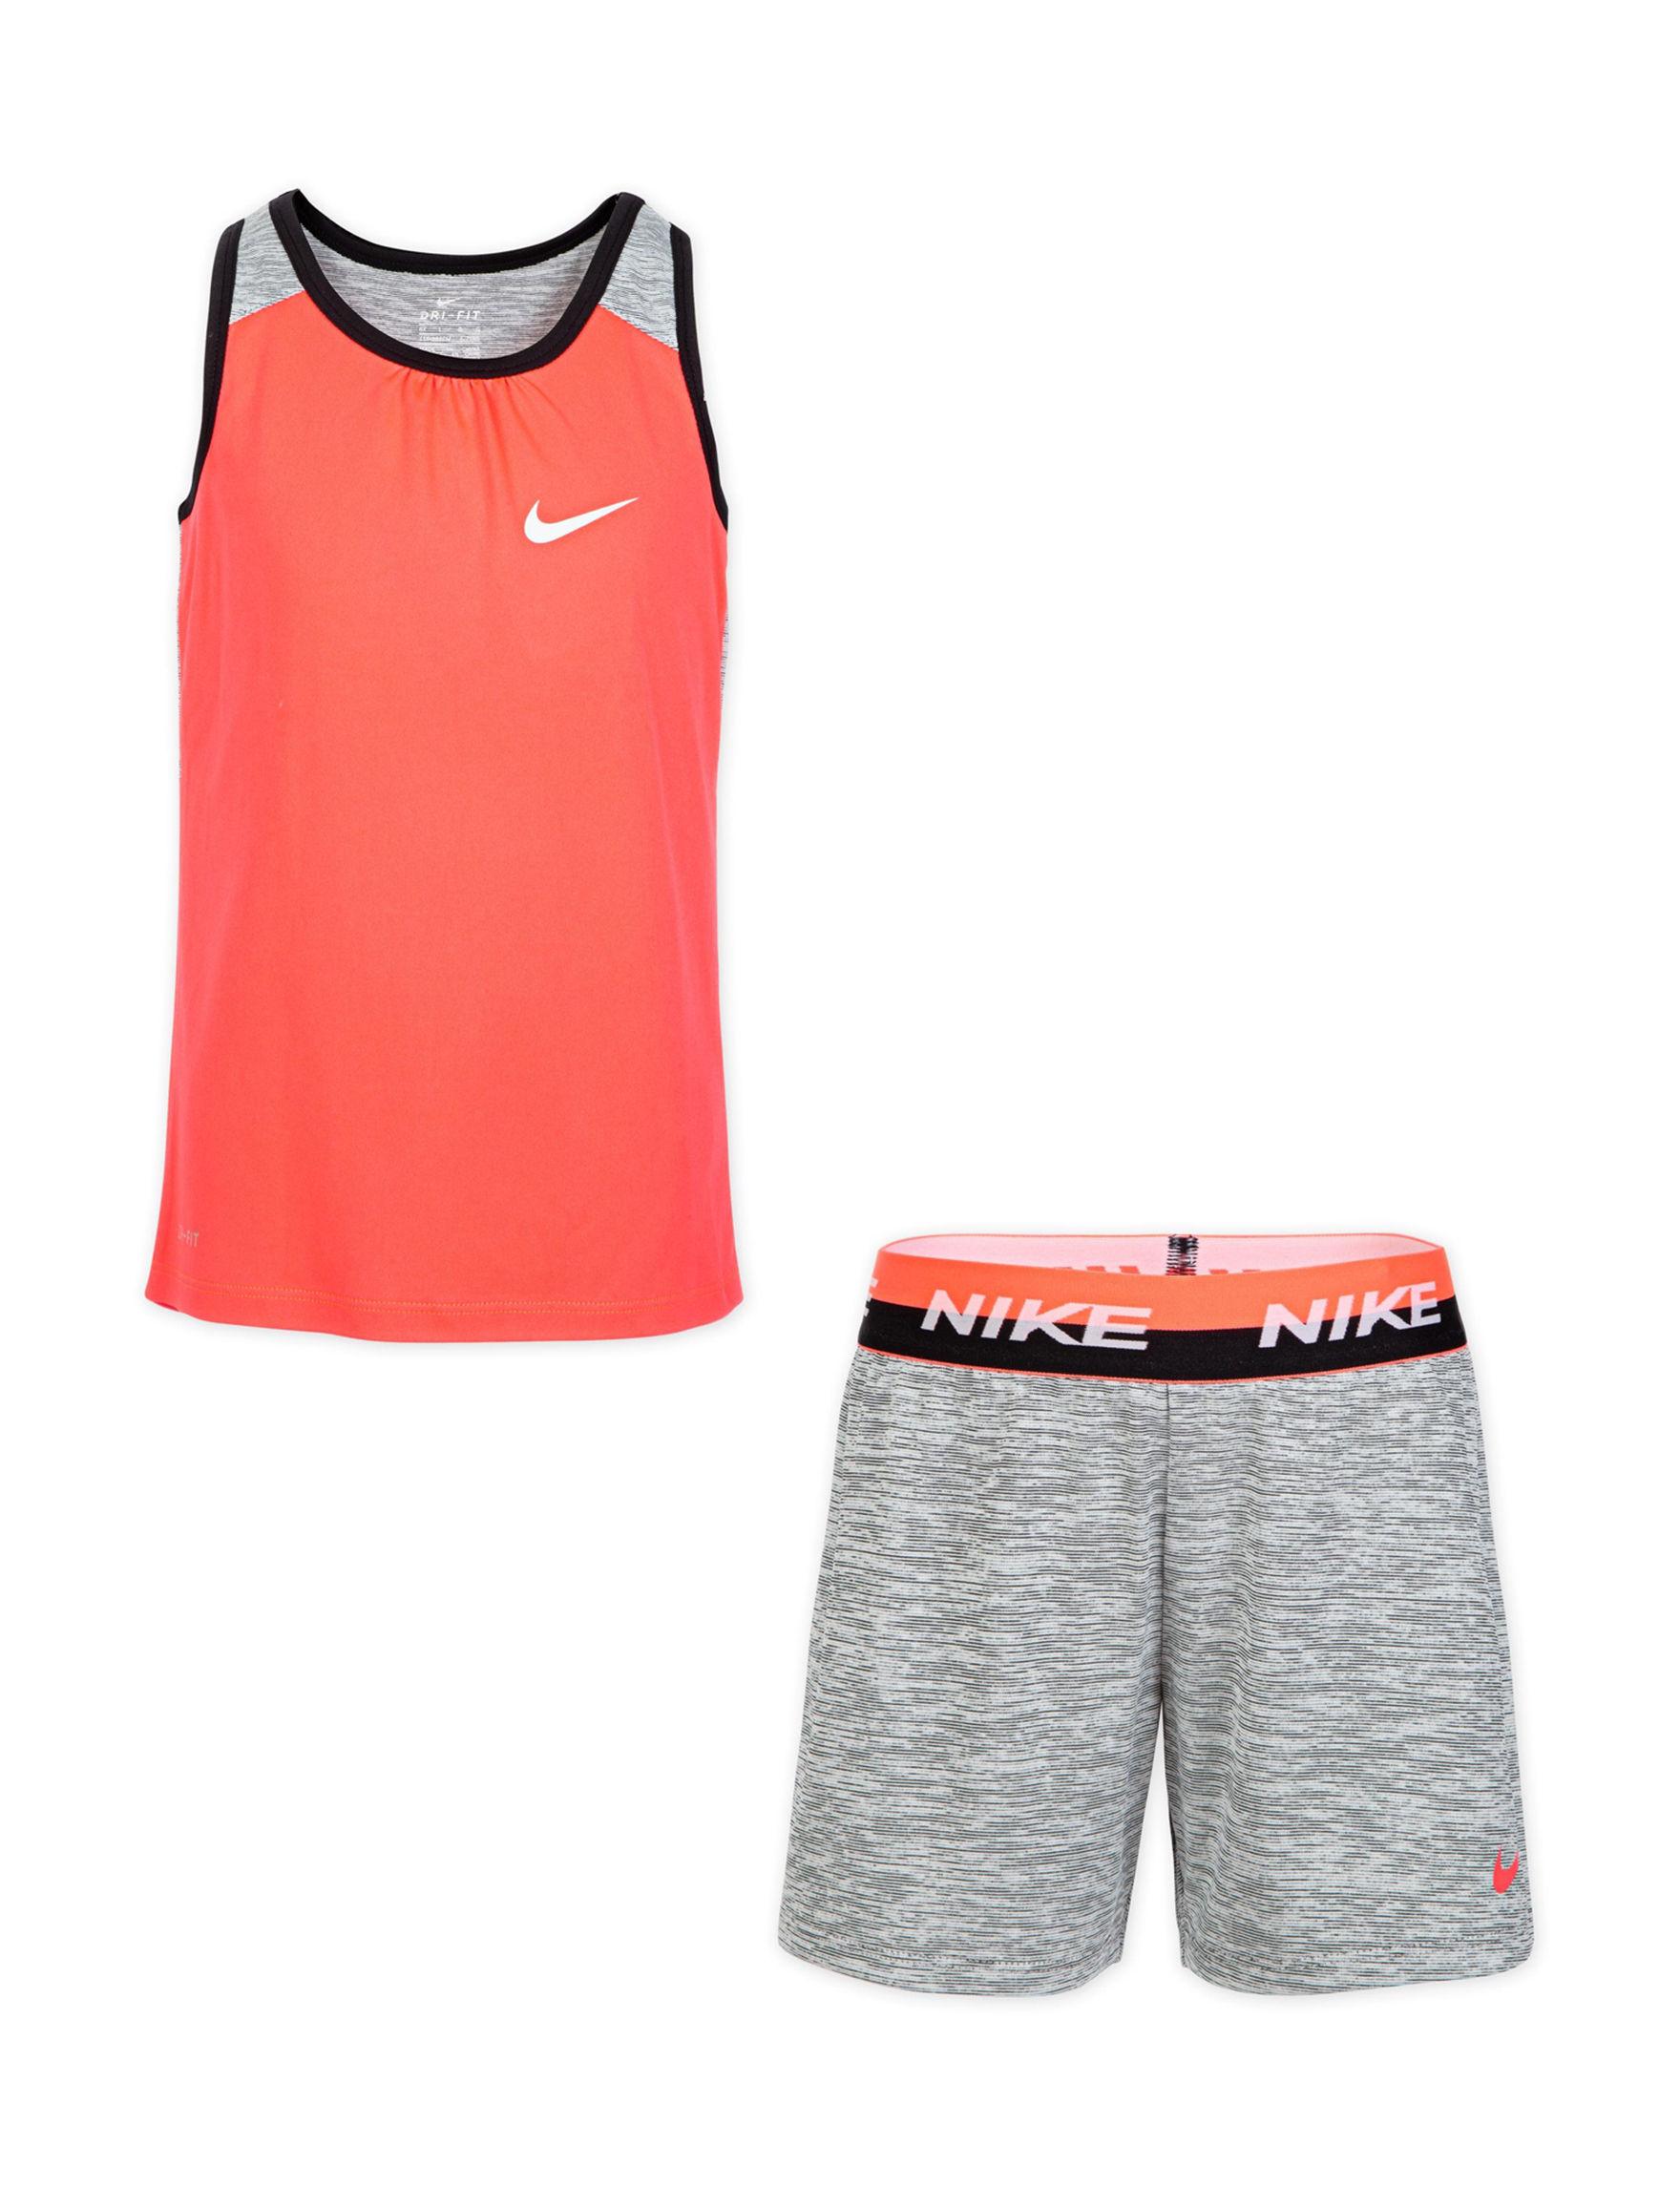 Nike Coral / Black